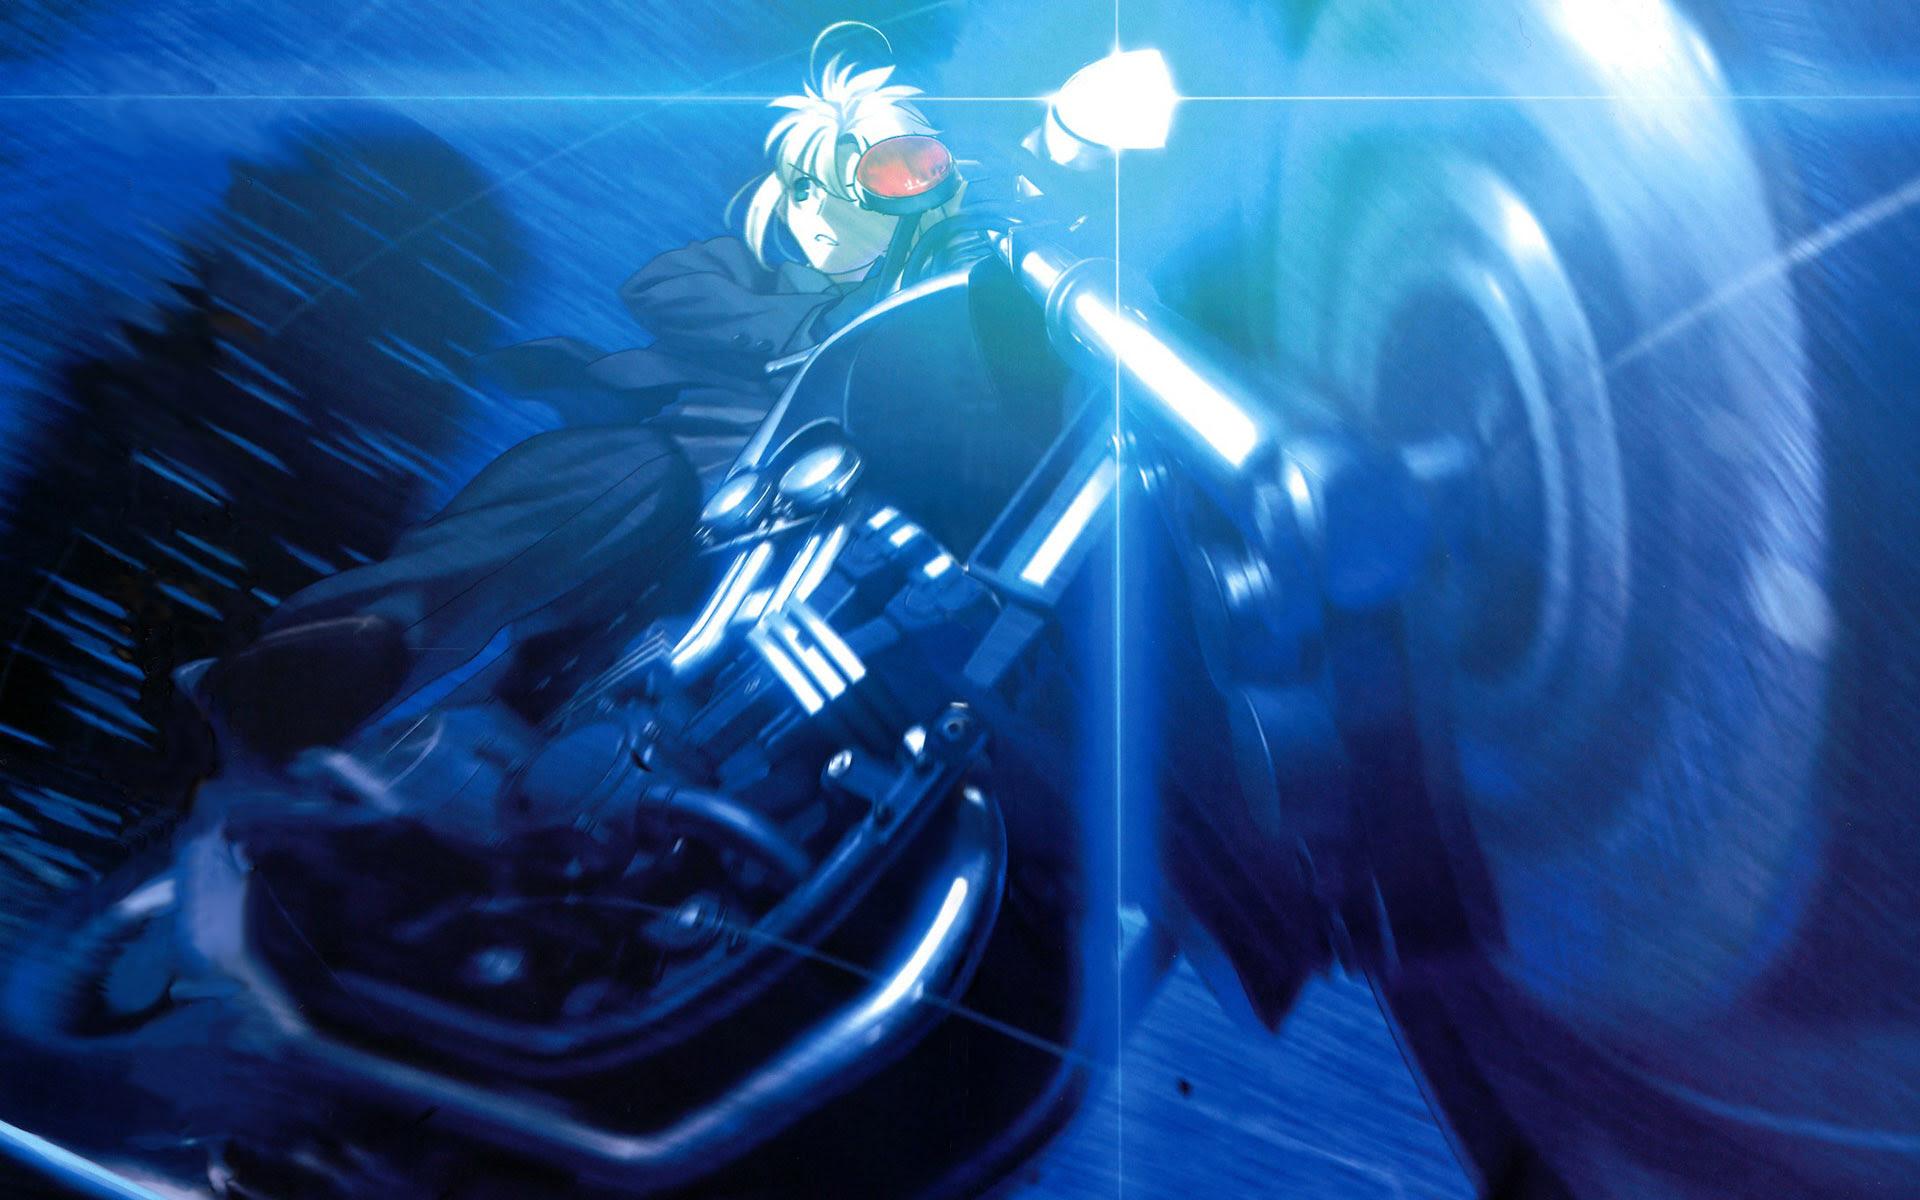 Fate Zero 壁紙 画像 Iphone スマホ待受画像02 二次元閉鎖空間